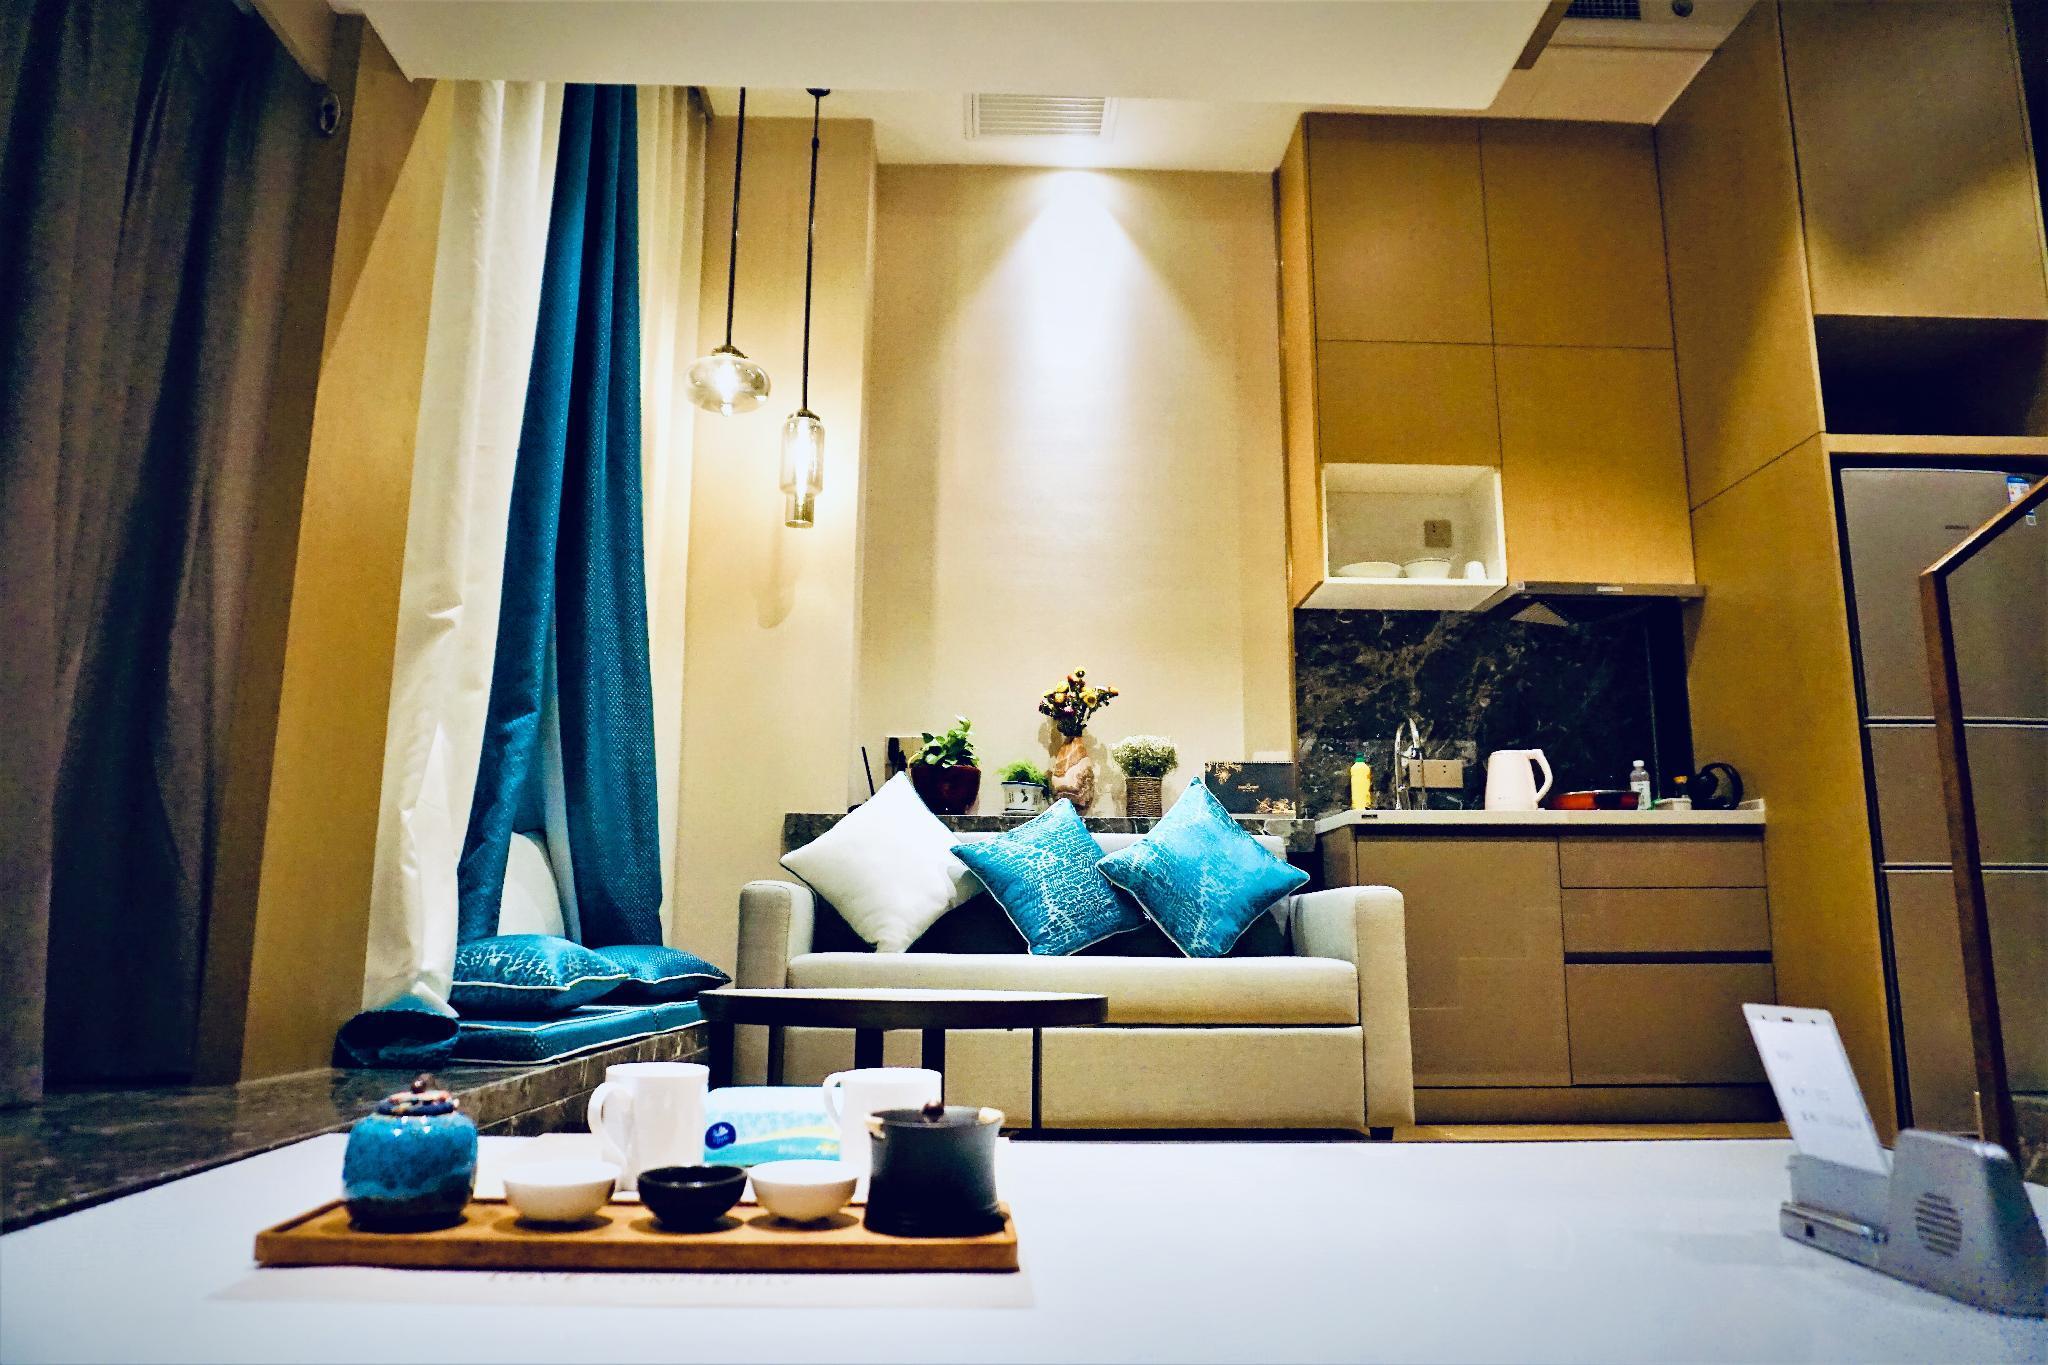 Nordic Cozy Luxury Apt  CBD Sanlitun Wangfujing